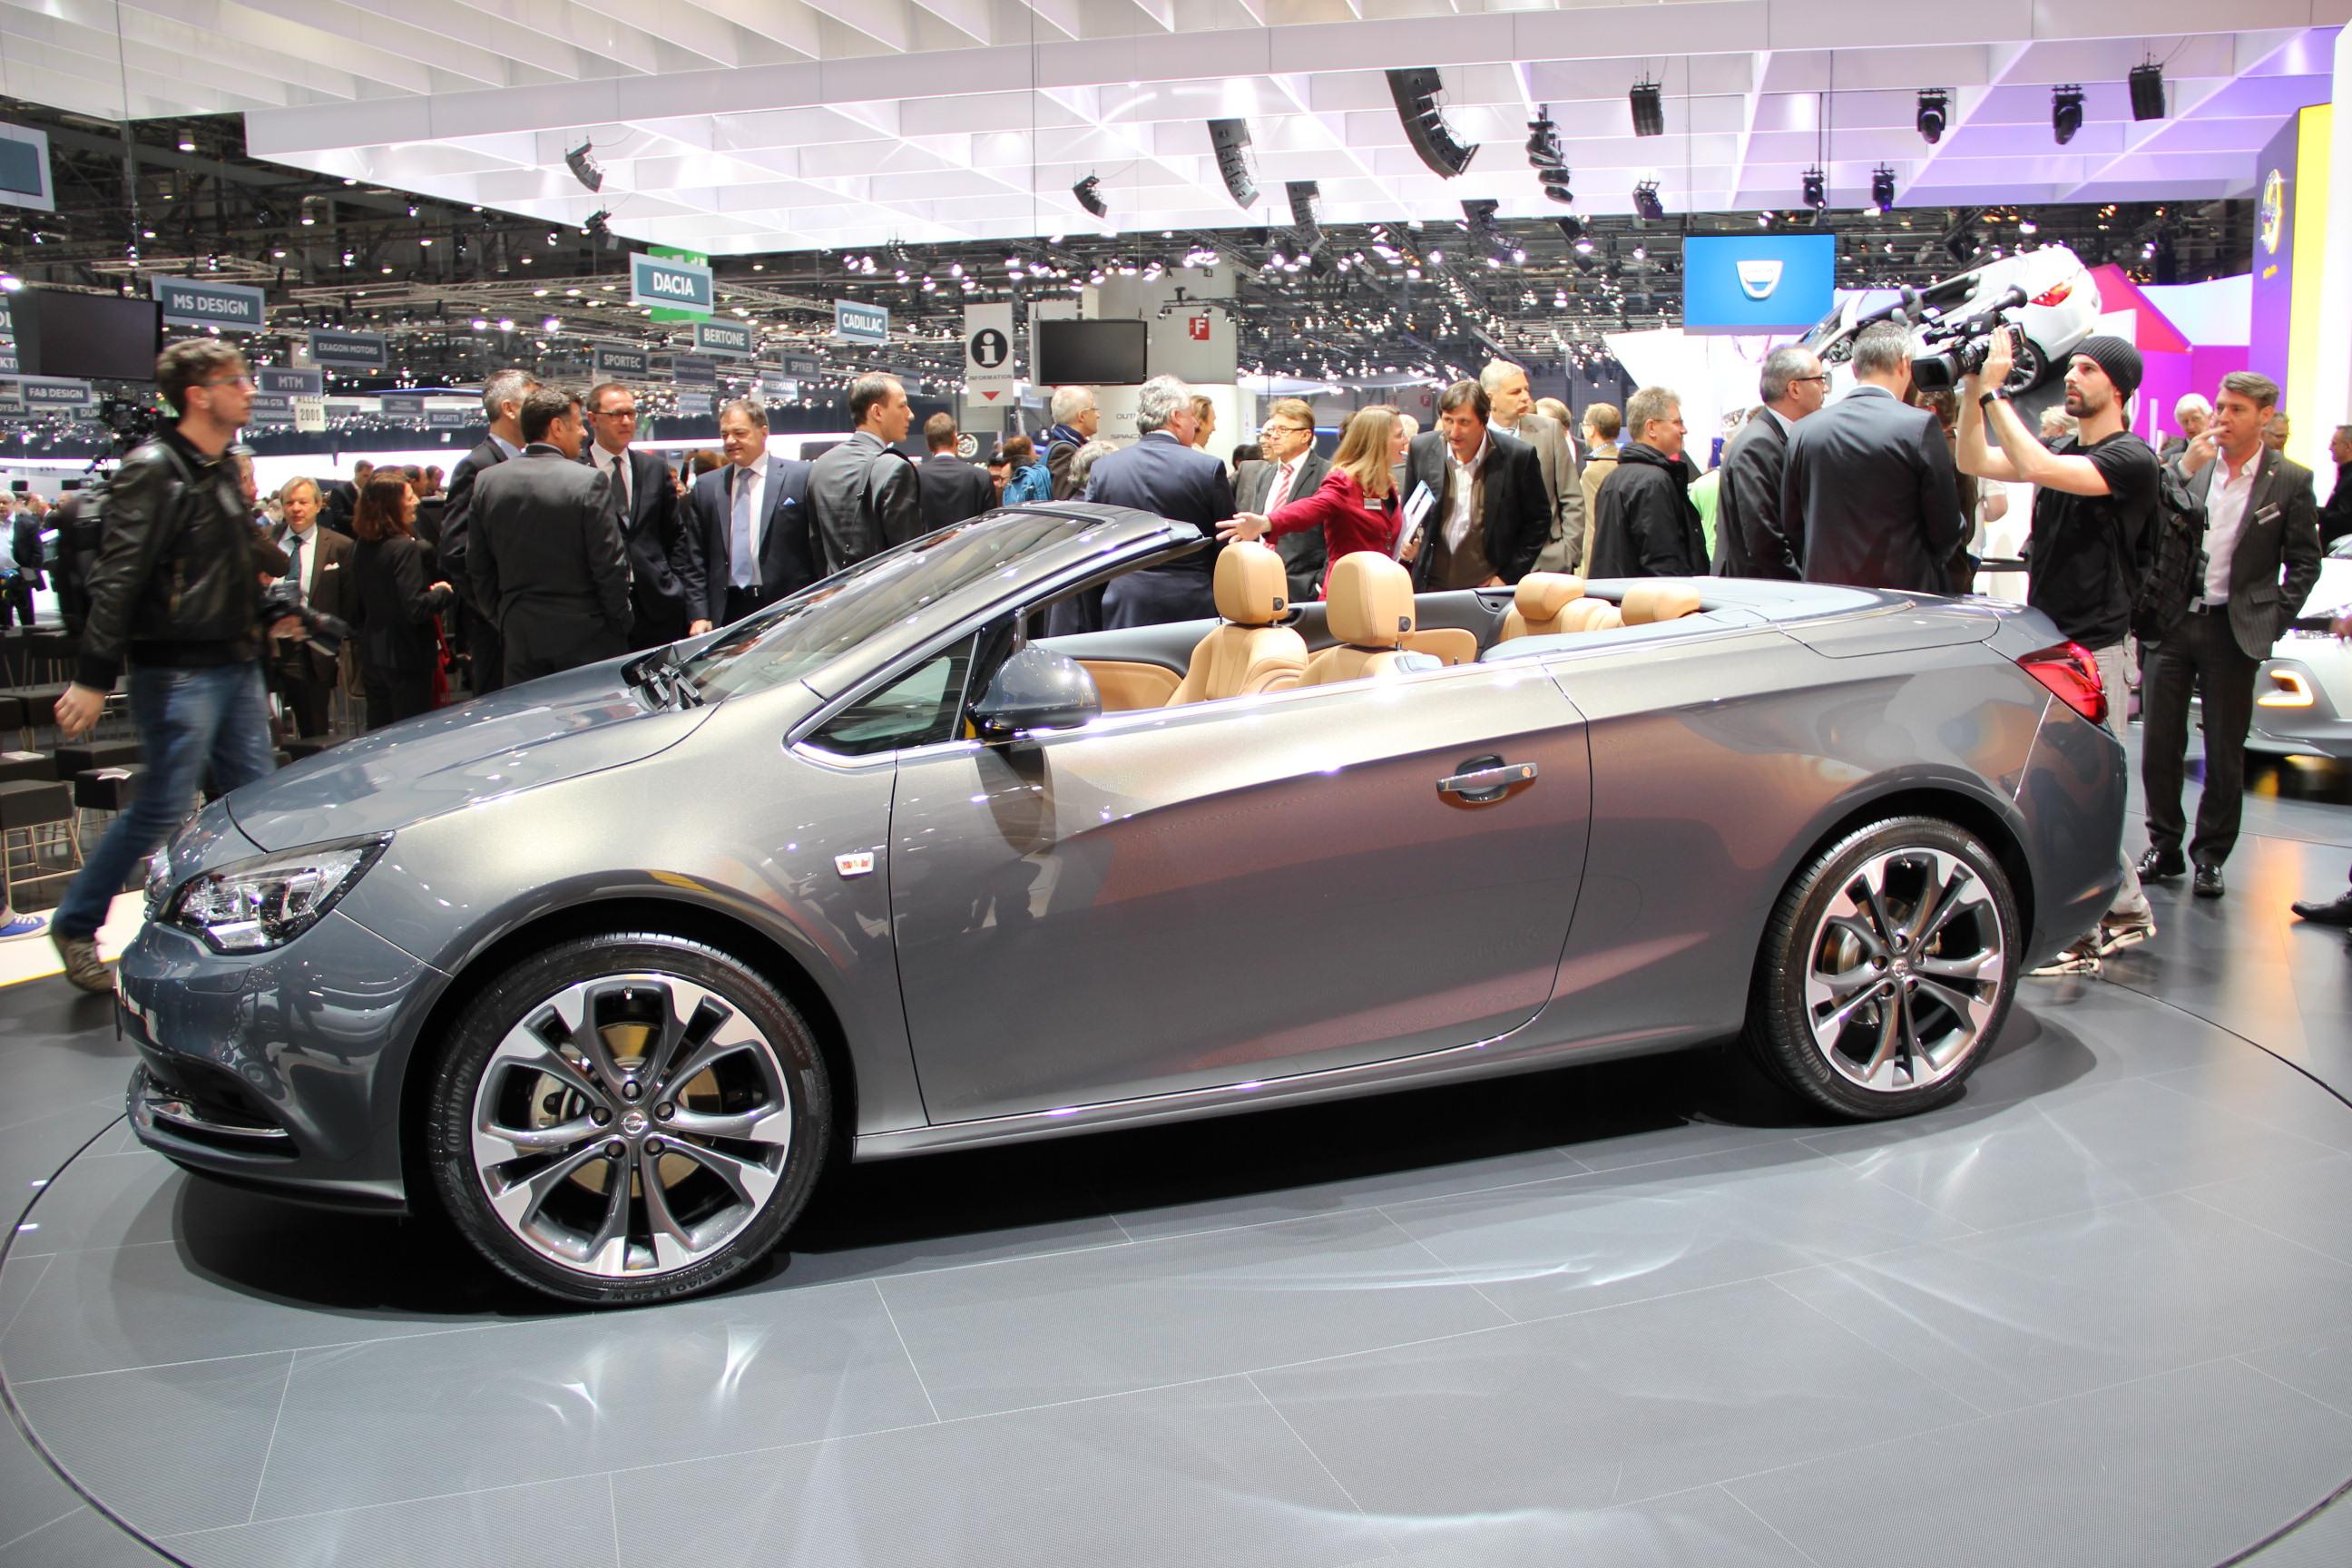 http://images.caradisiac.com/images/4/8/8/0/84880/S0-En-direct-de-Geneve-2013-Opel-Cascada-jolie-287012.jpg